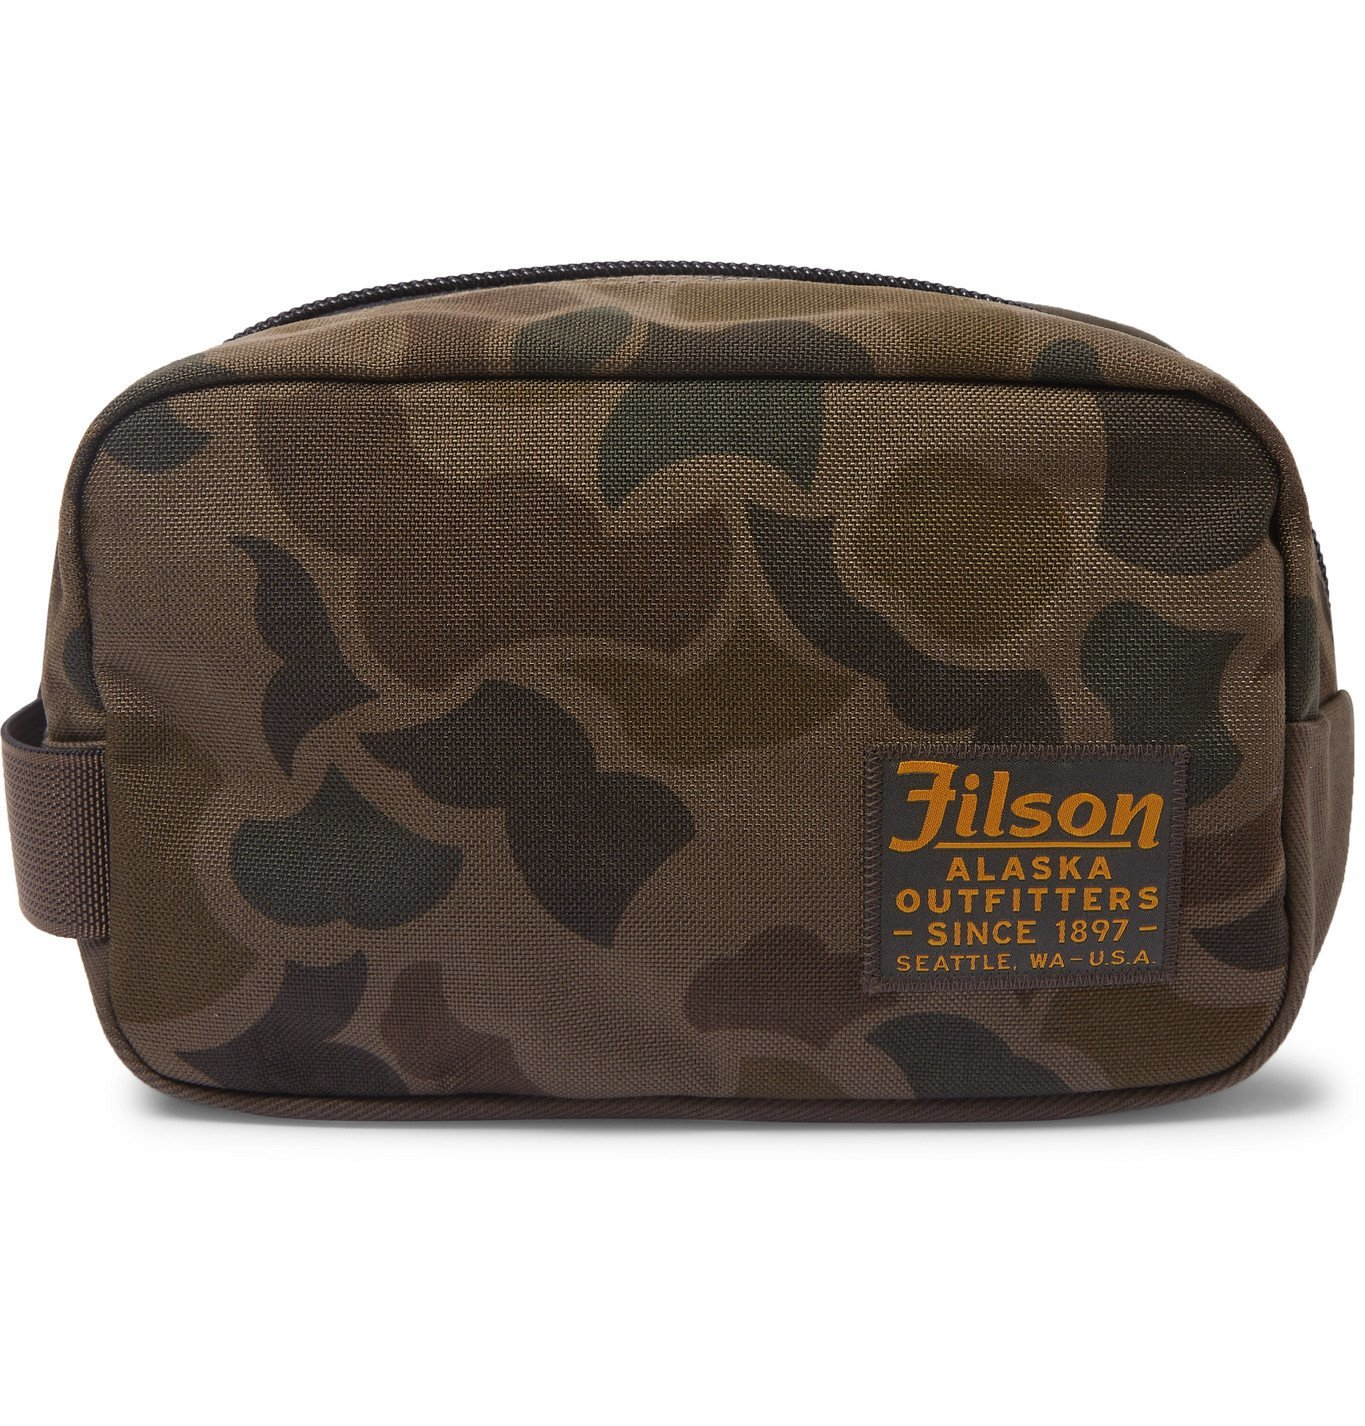 Filson - Limited Edition Camouflage-Print CORDURA Nylon Wash Bag - Green